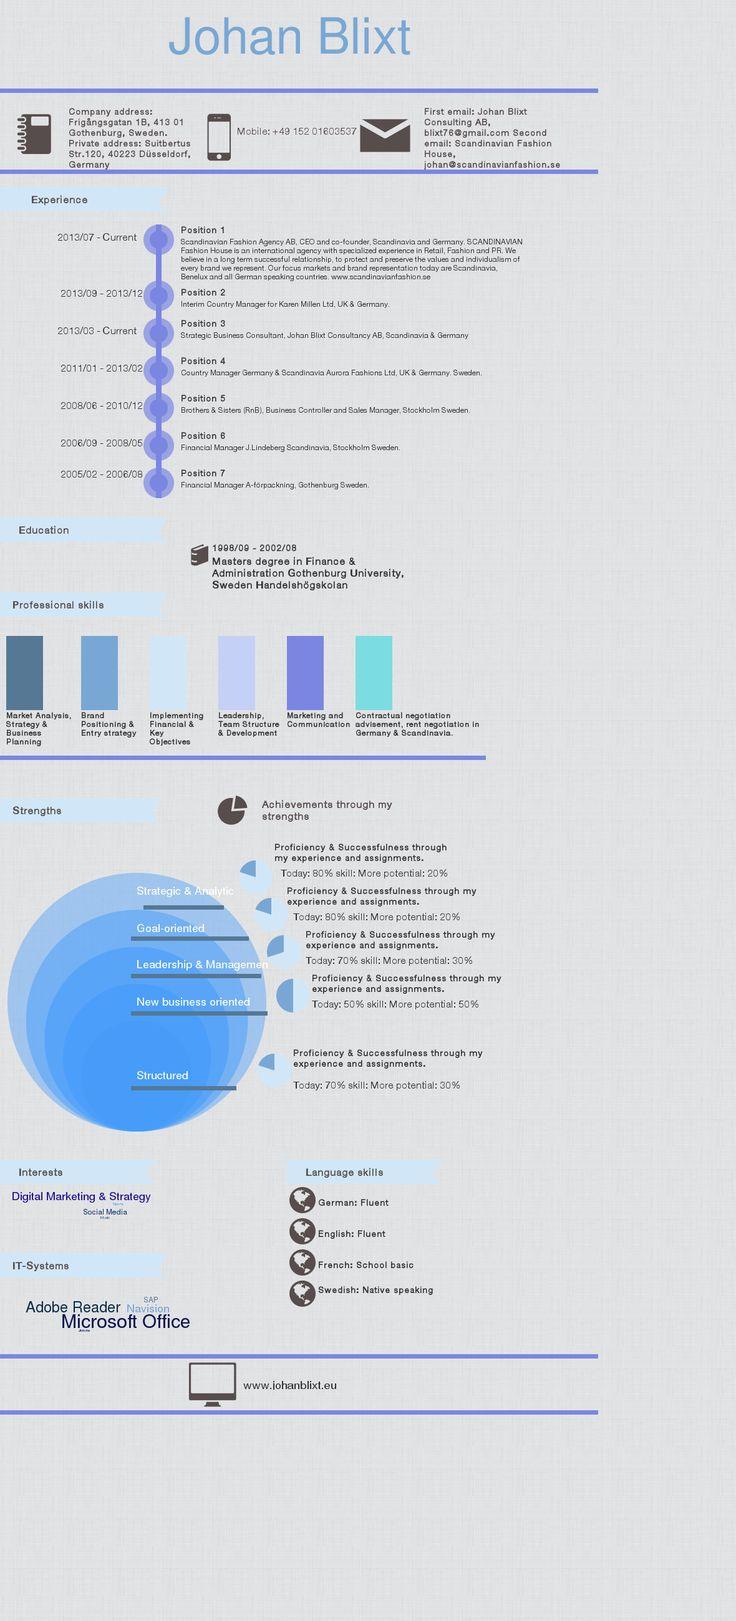 #resume #johanblixt #jobs #cv #lebenslauf #infographic